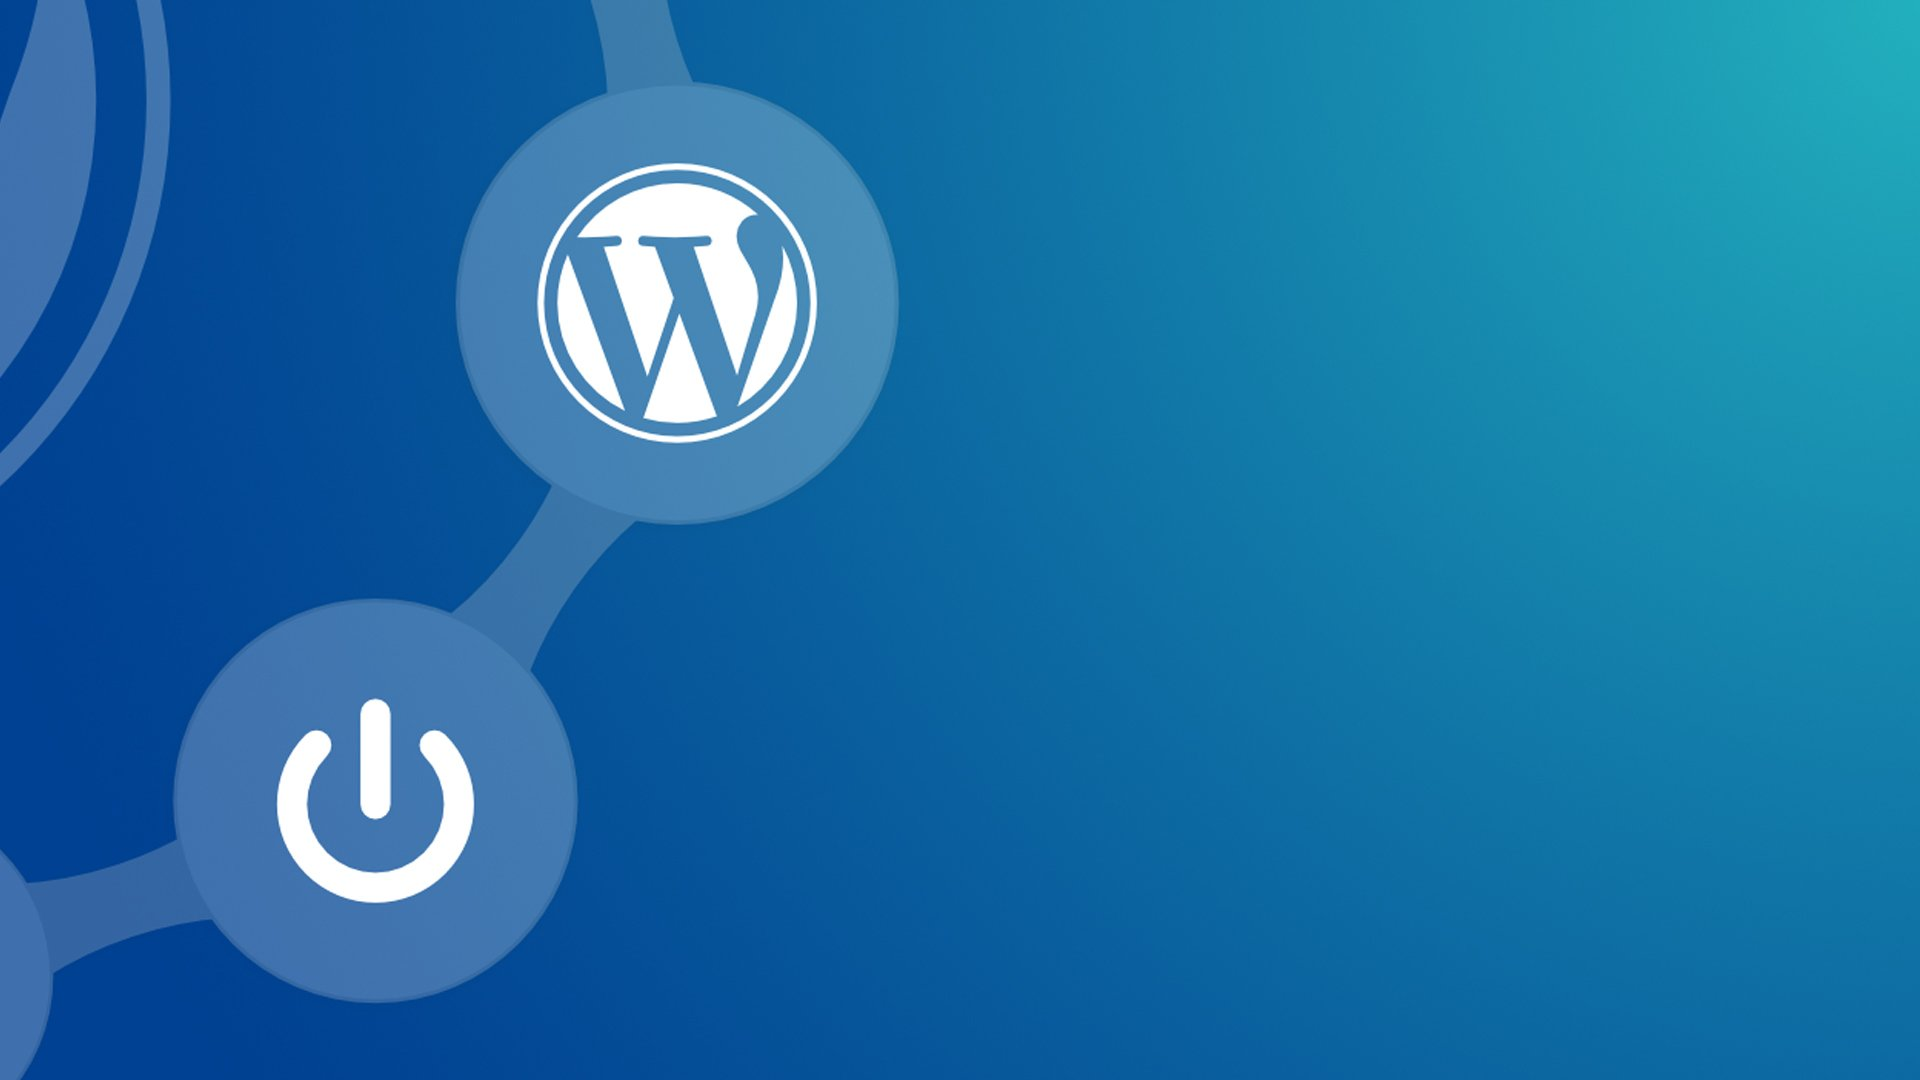 Using WordPress Widgets and Plugins to Enhance Your Website